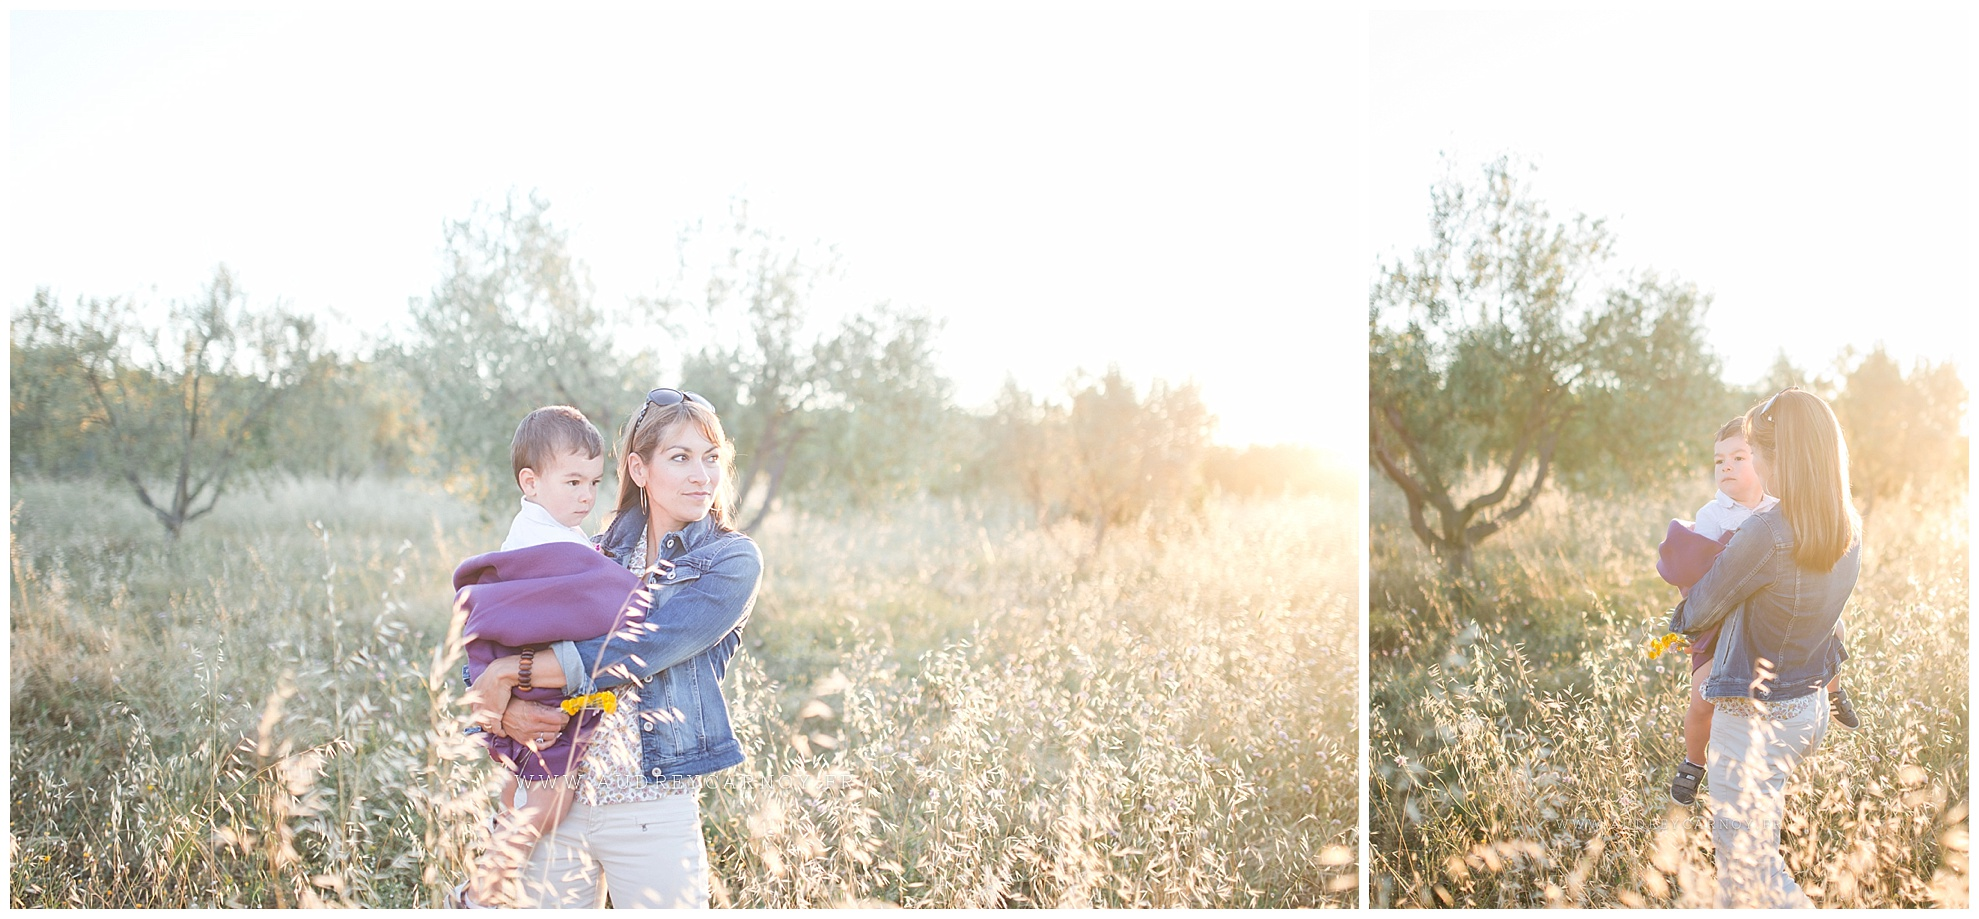 Séance famille - Valensole | Nathalie 4